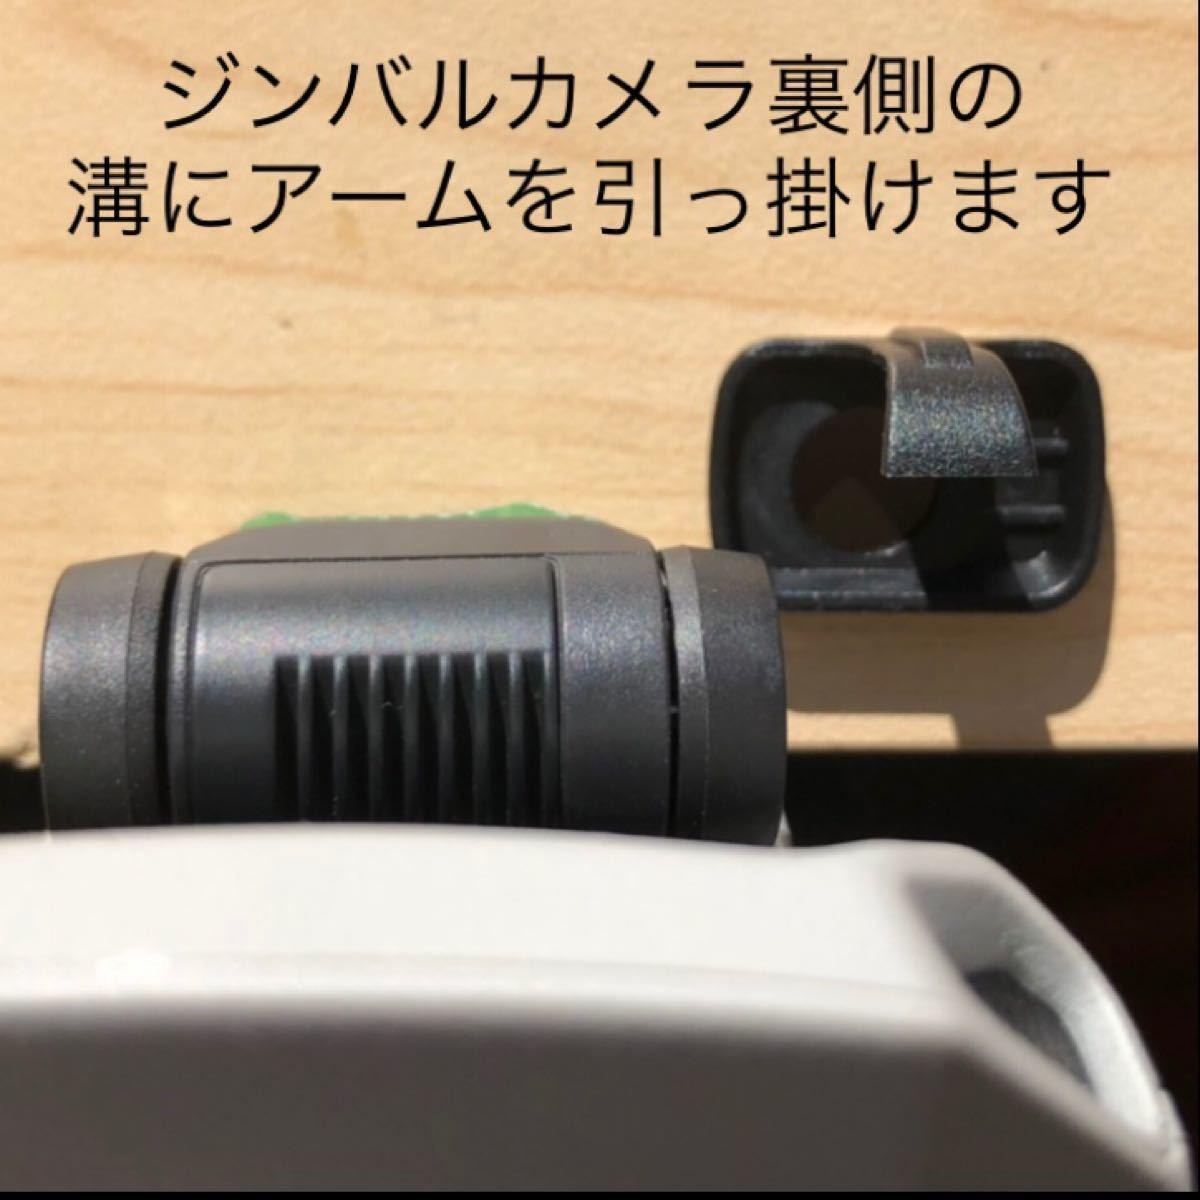 ☆MCUV紫外線カットフィルタ ★Mavic Mini ★DJI MINI 2